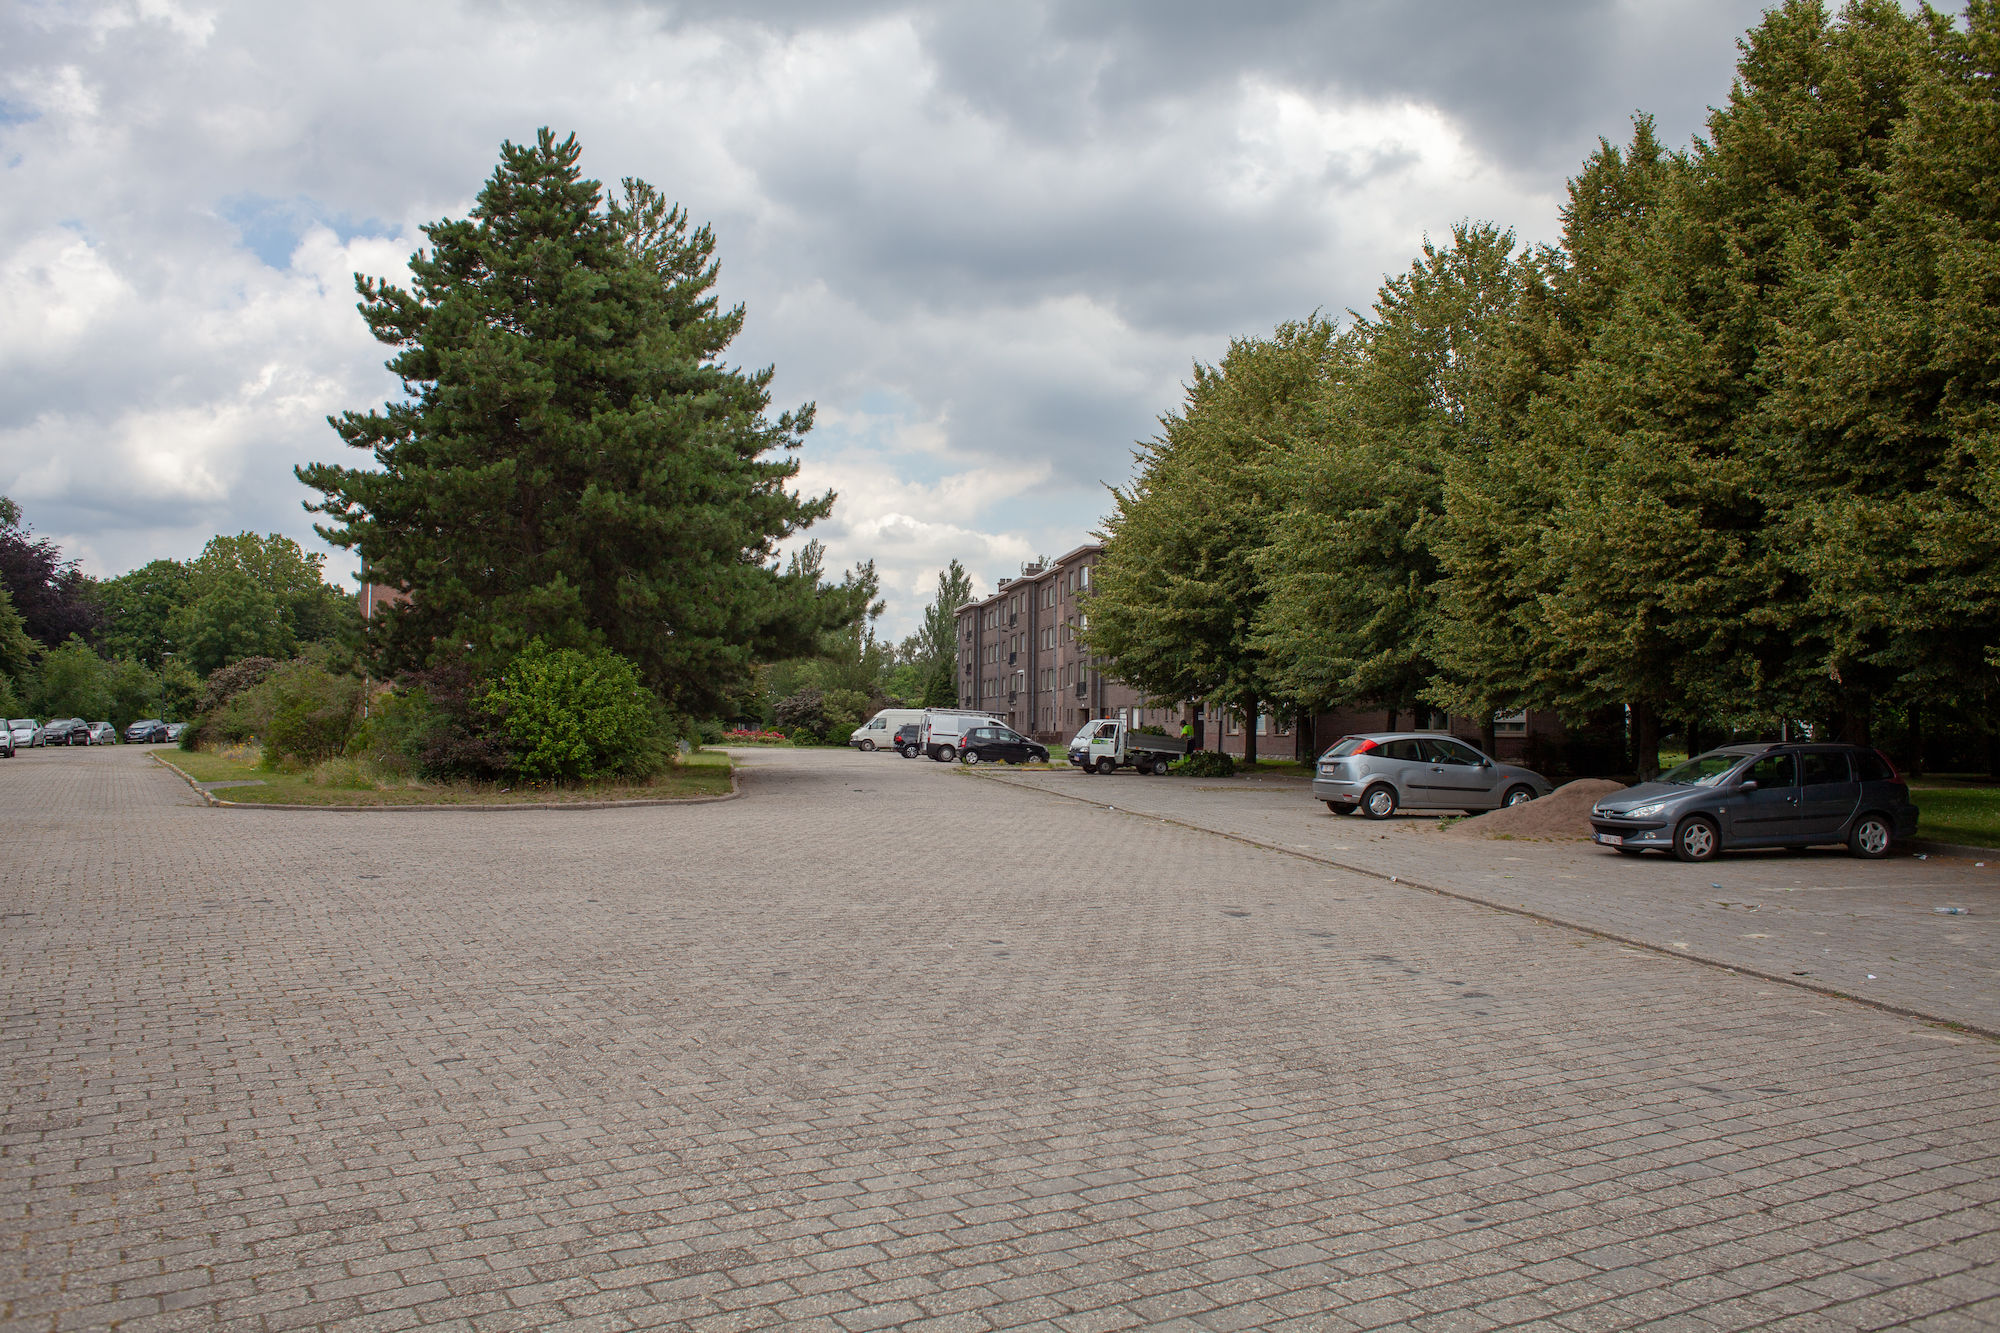 2019-07-02 Muide Meulestede prospectie Wannes_stadsvernieuwing_IMG_0344-2.jpg